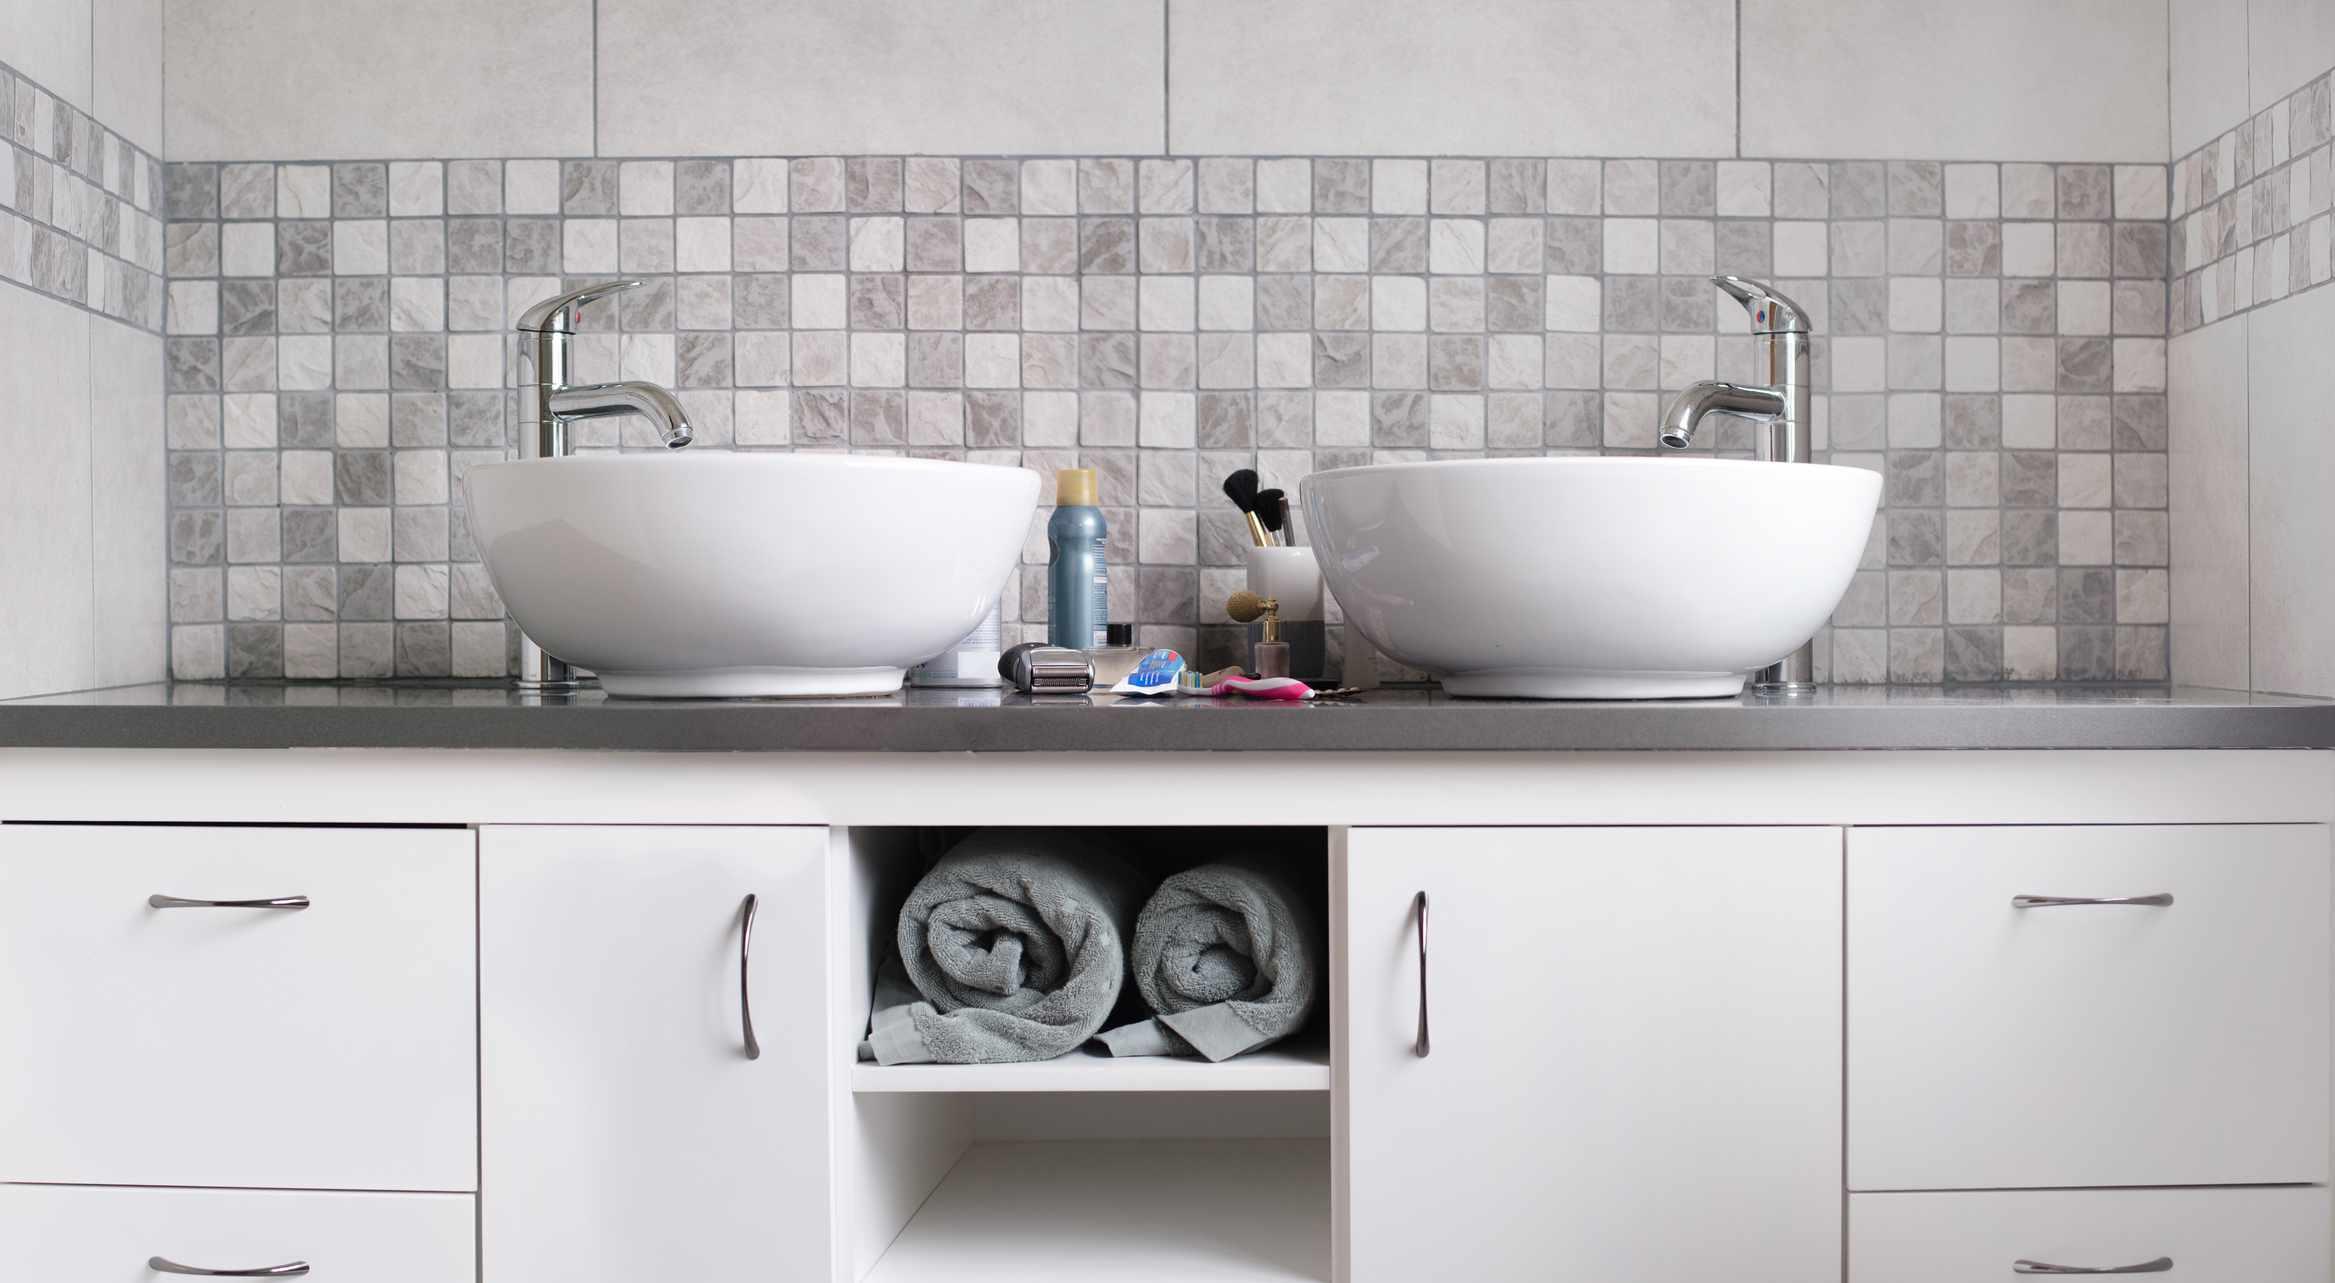 Bathroom sink backsplash